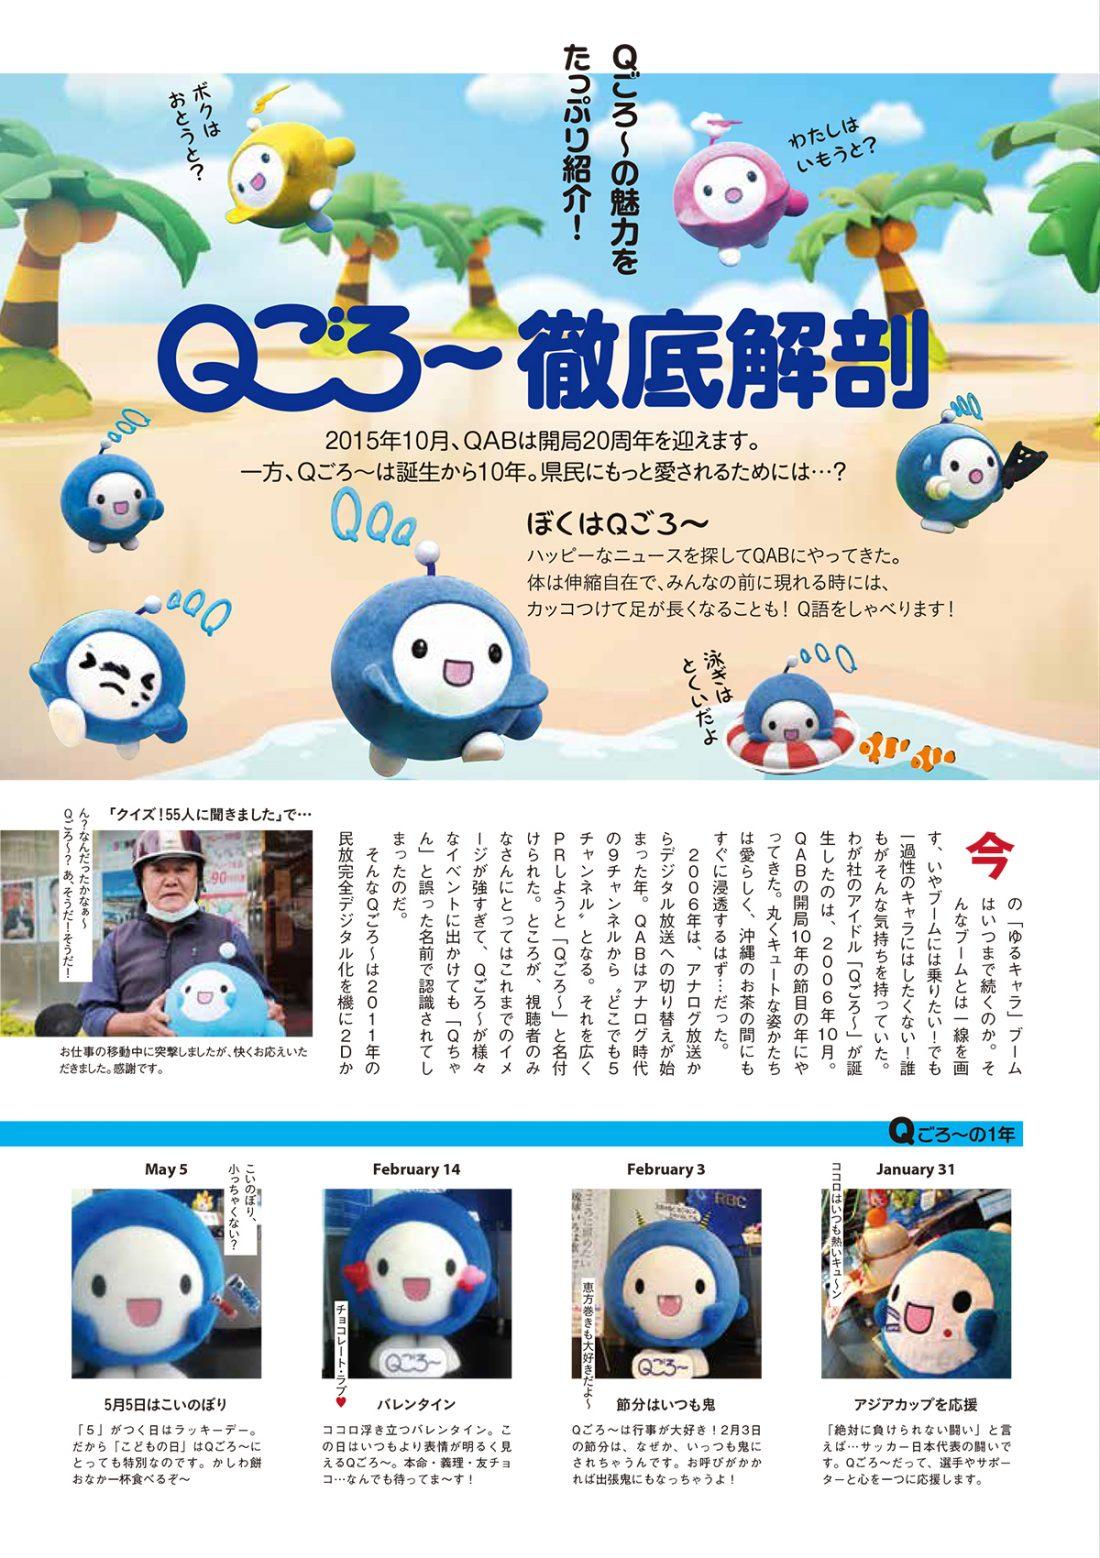 http://www.qab.co.jp/qgoro/wp-content/uploads/quun_0302-1100x1558.jpg